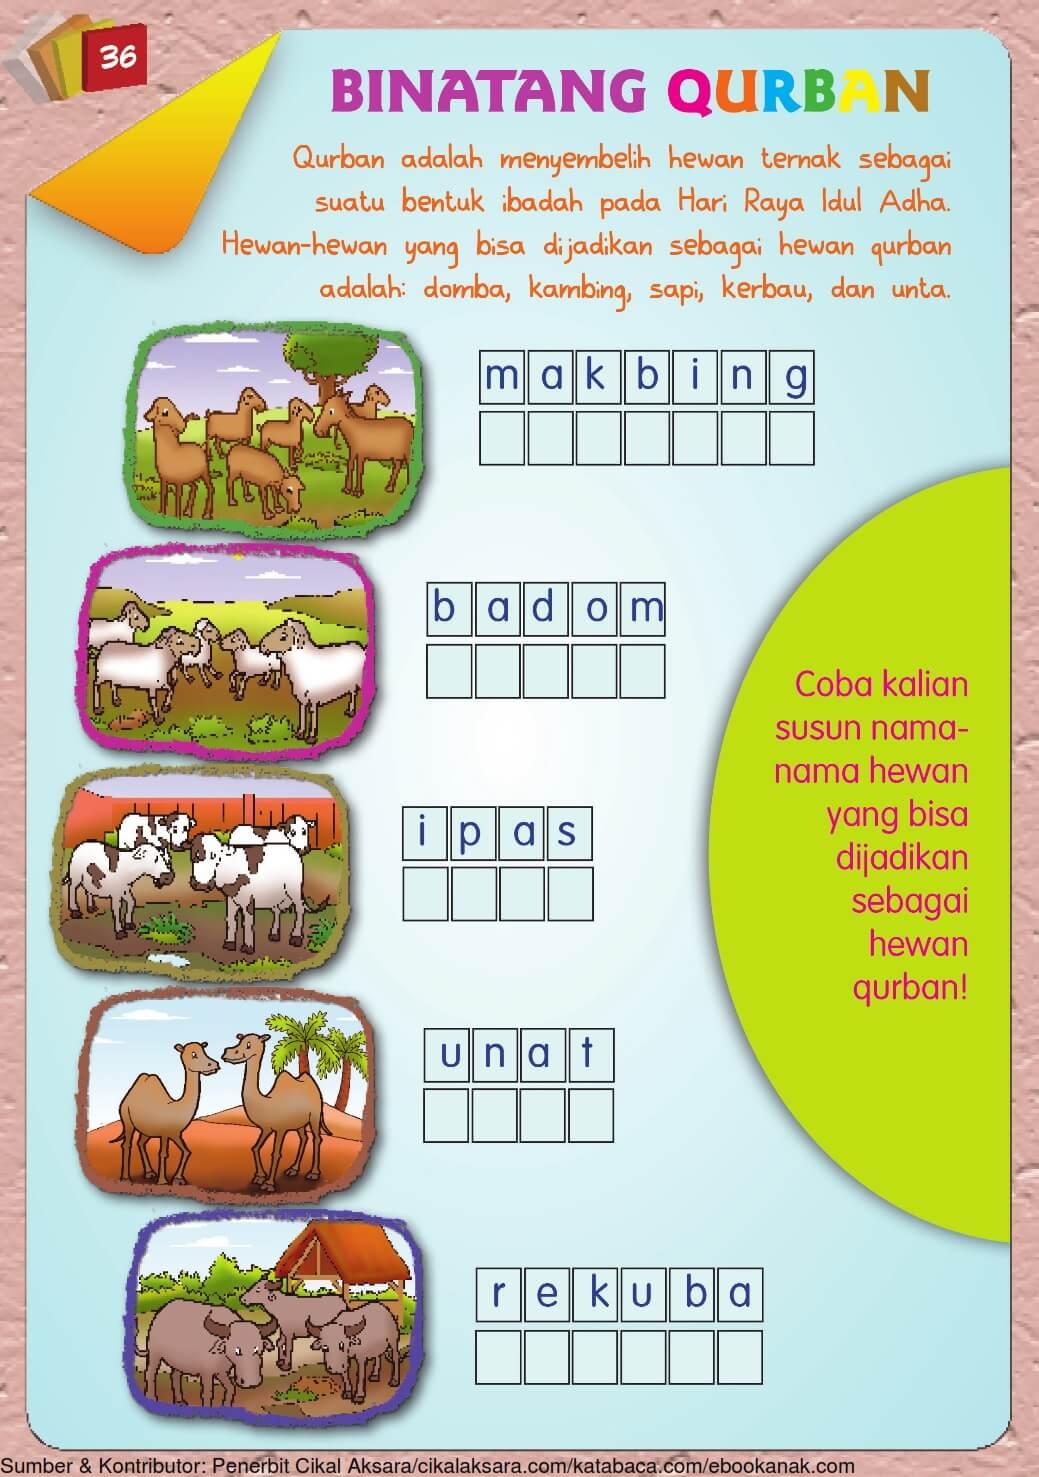 Buku Pintar Aktivitas Anak Shaleh Binatang Qurban 37